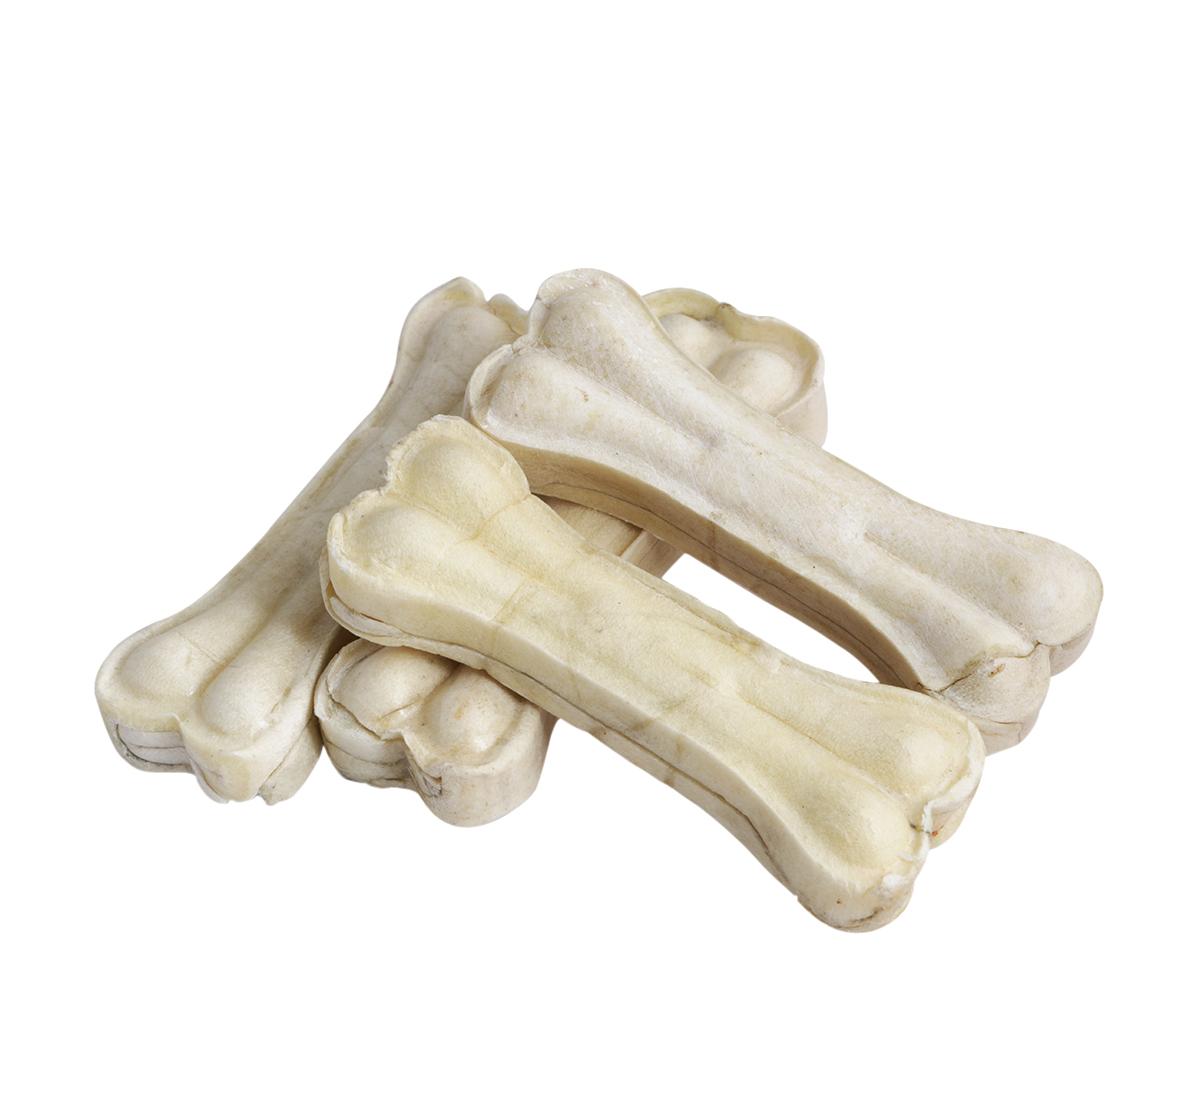 Pet en Care Rawhide Pressed Bone - 10.16 Cm - 4 Pcs